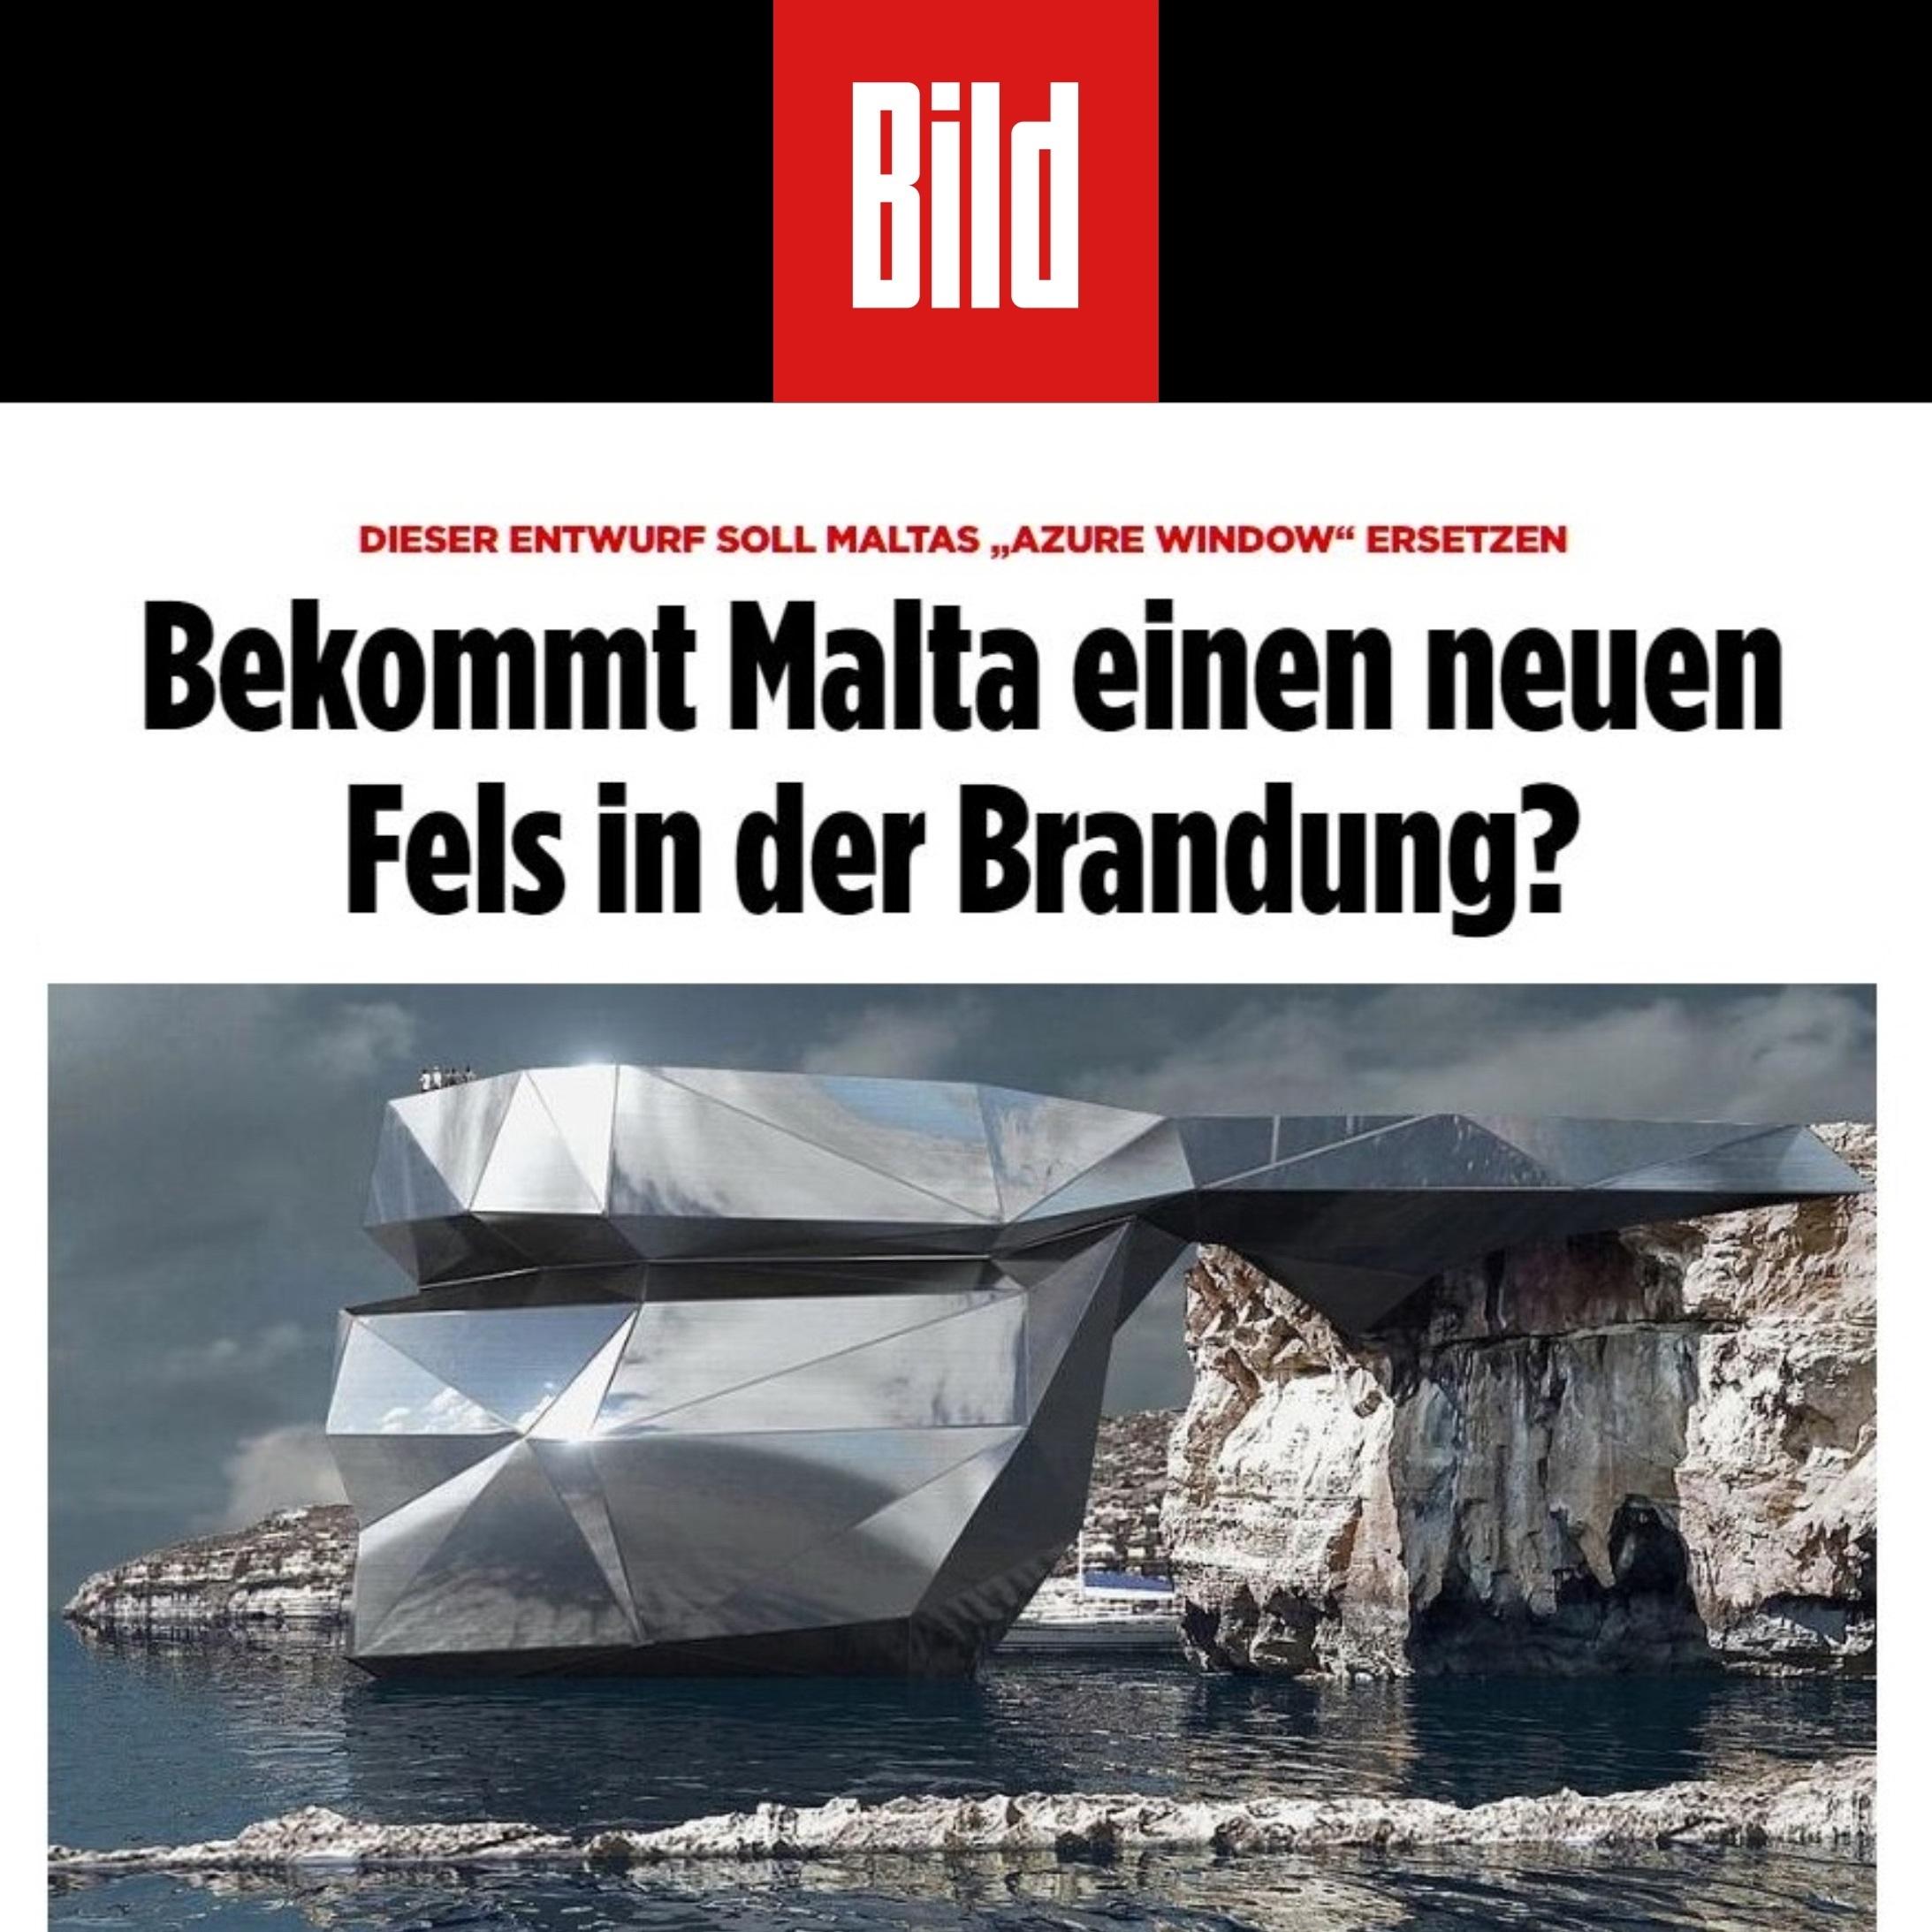 BILD GERMANY